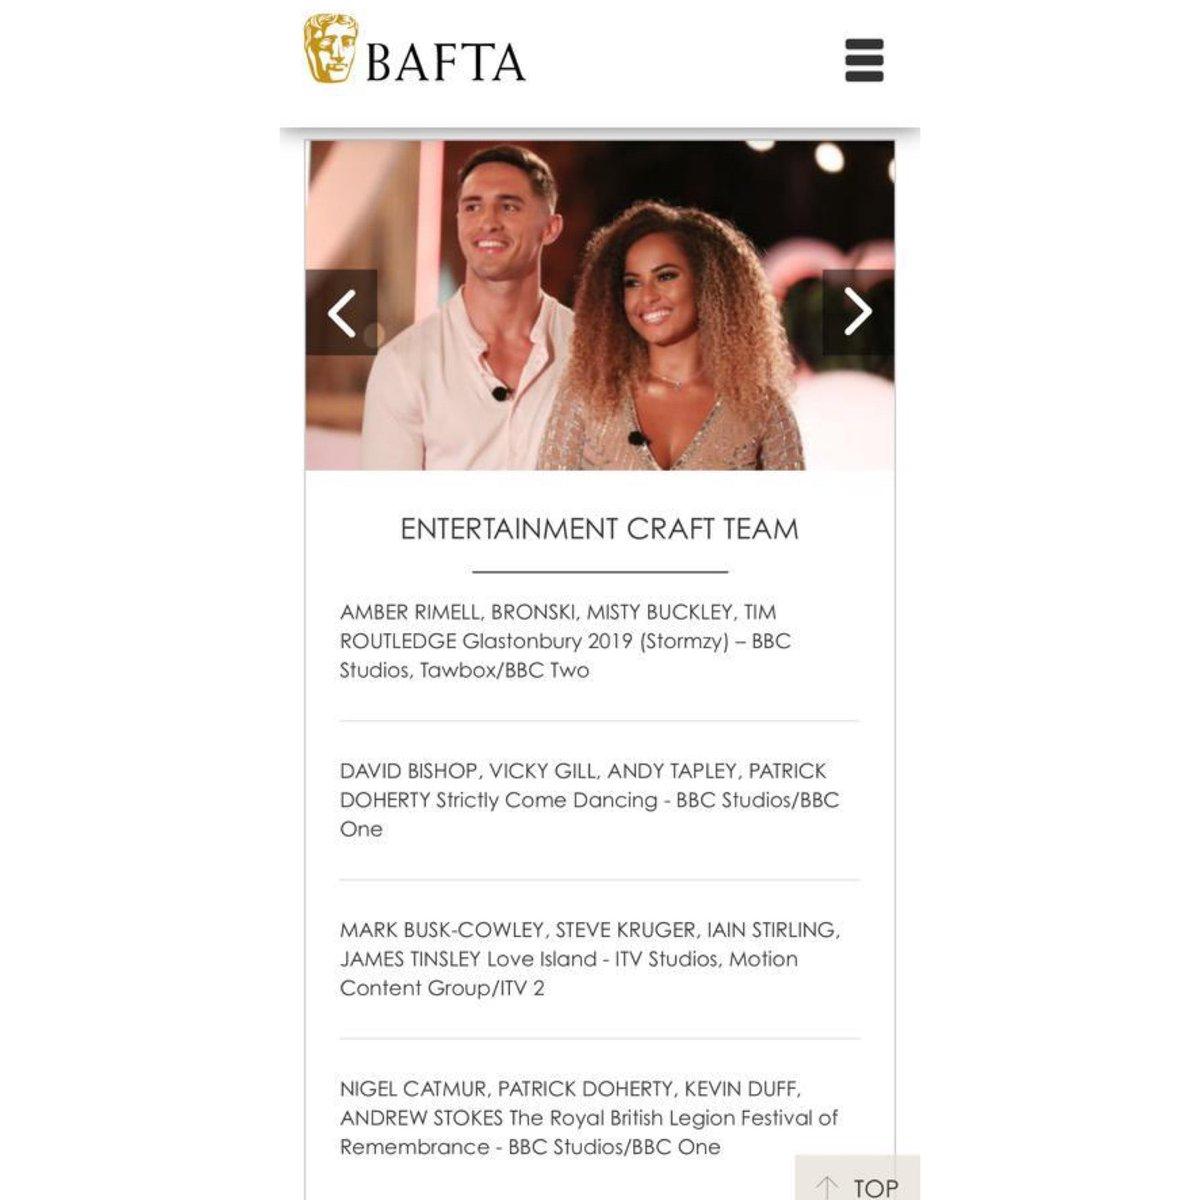 Thank you @BAFTA. Congratulations @LoveIsland!